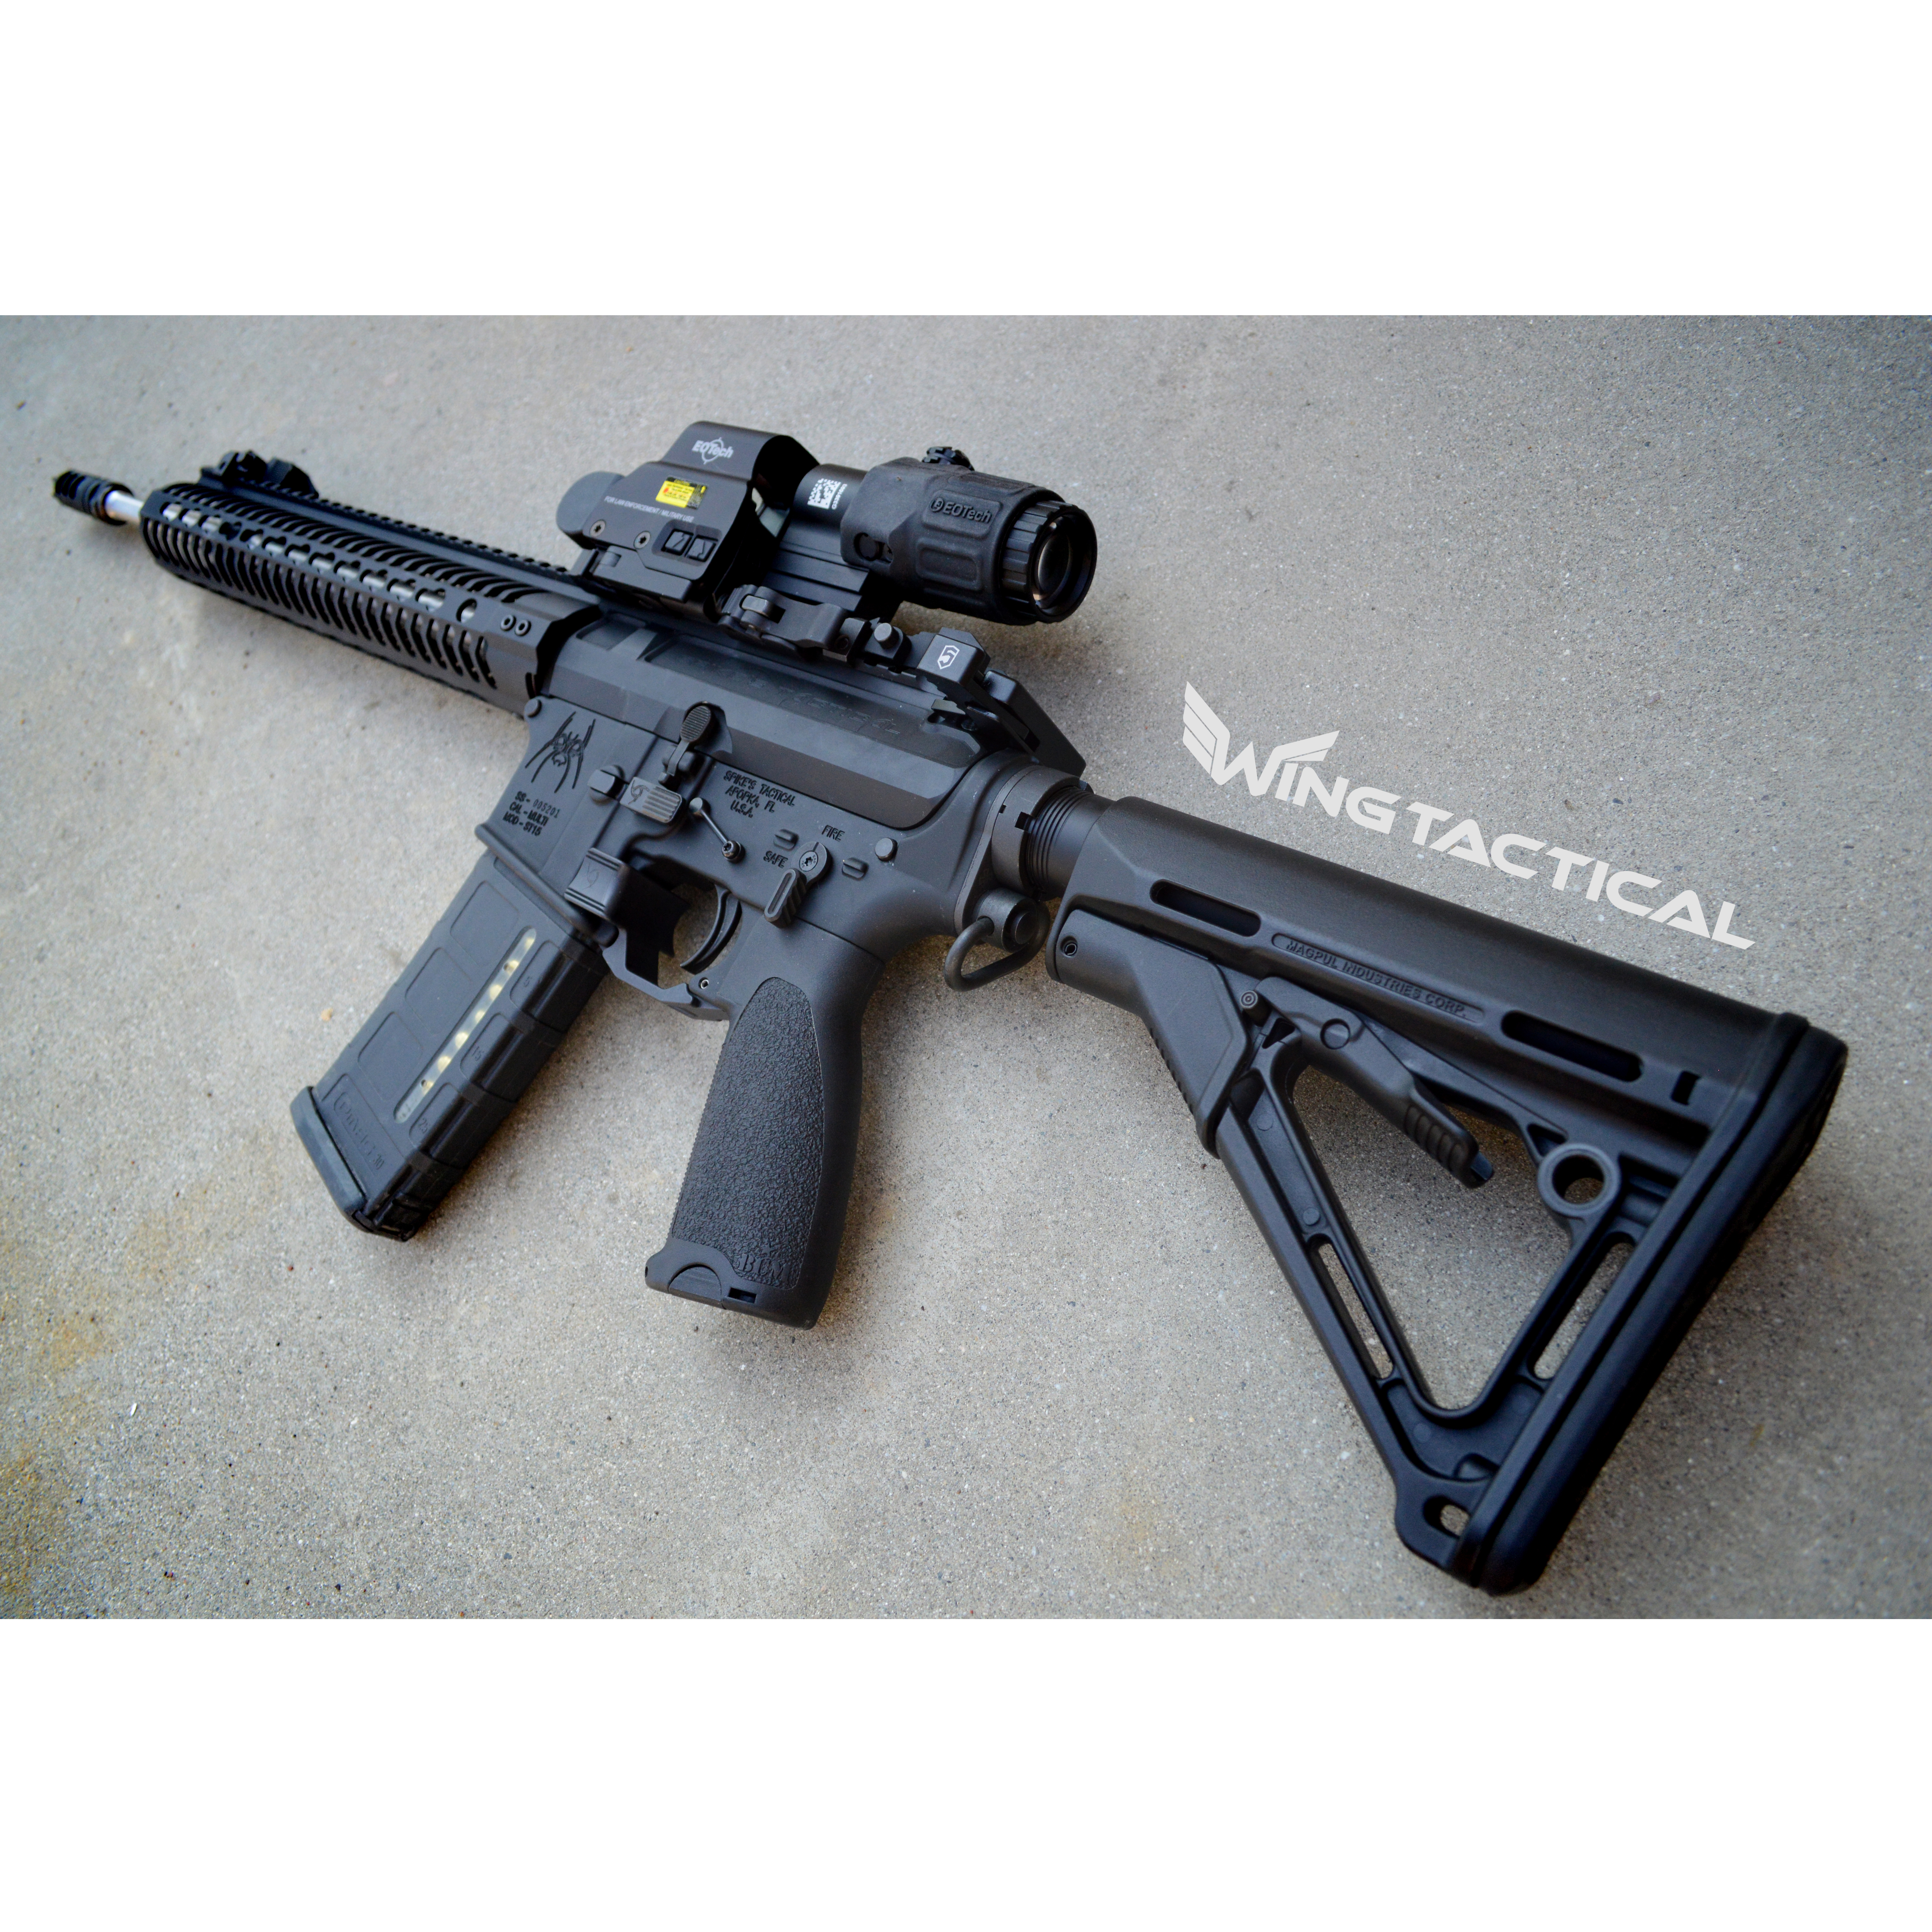 Magpul CTR Stocks on AR-15